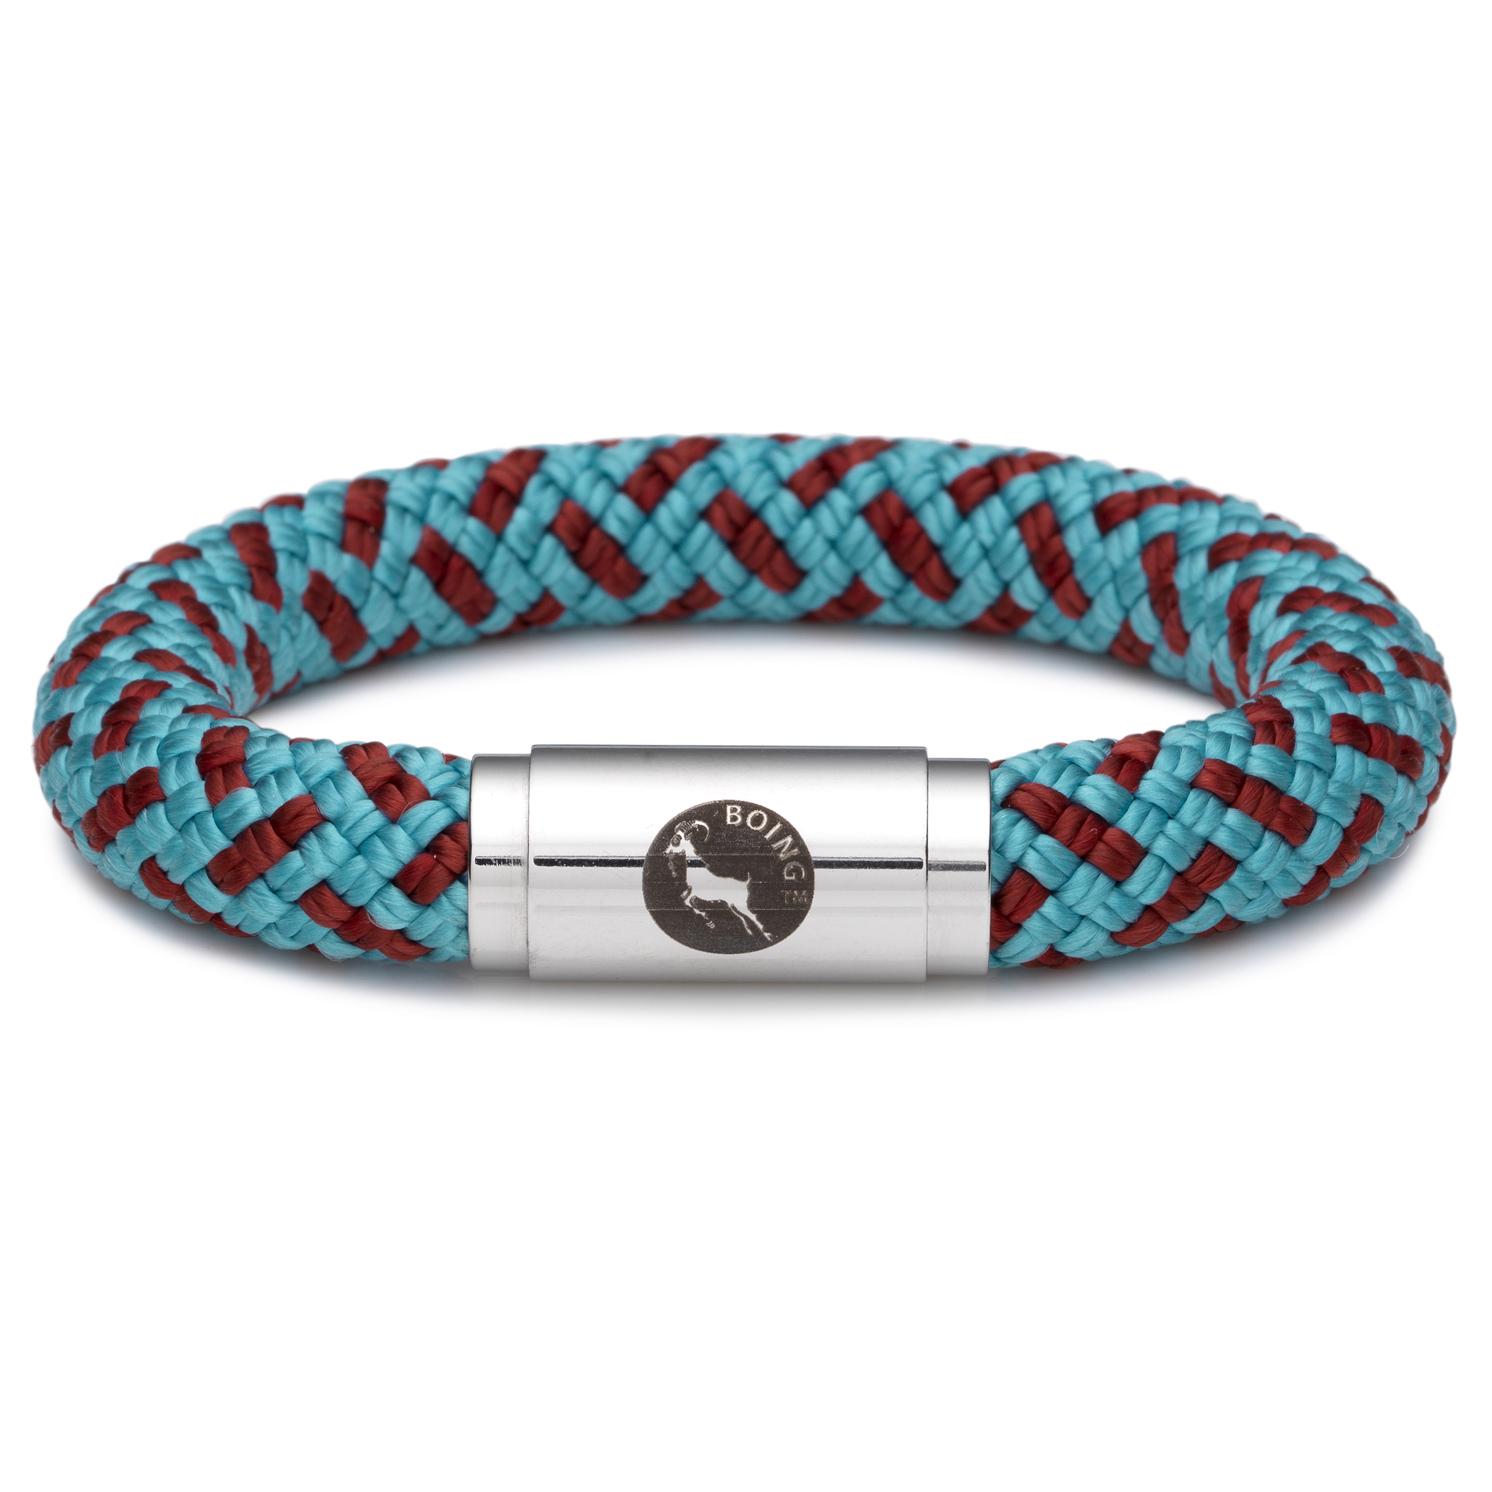 Boing – Chunky XXLarge Wristband in Inca Blue